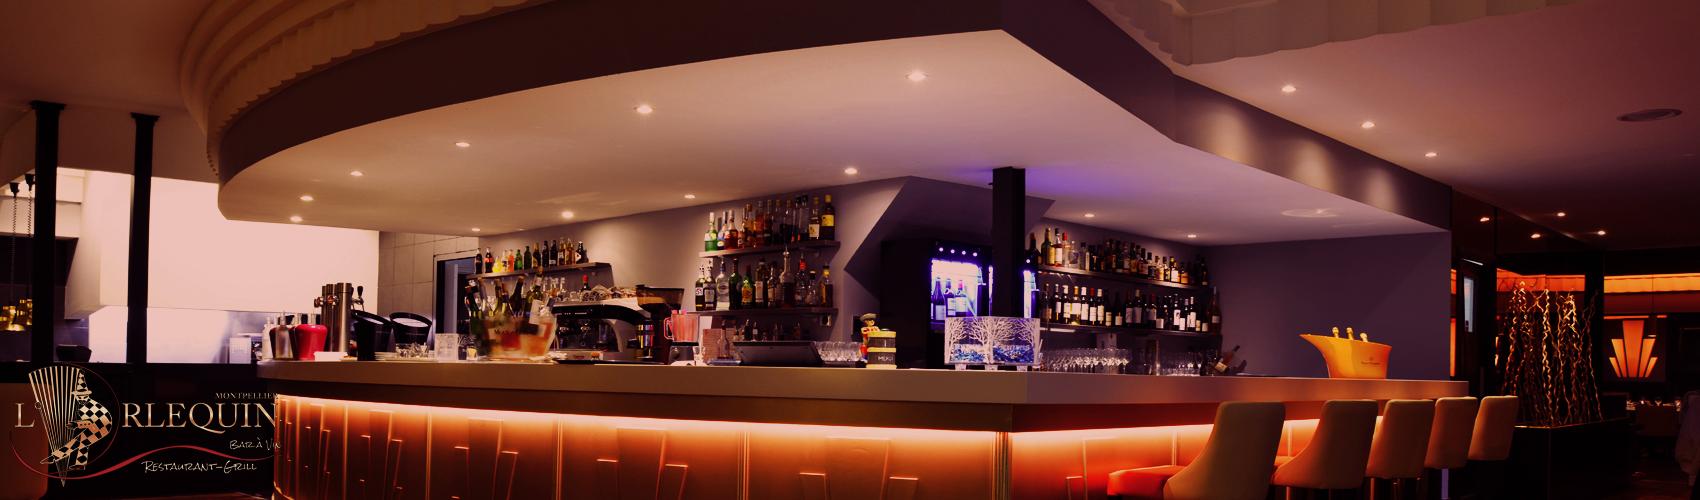 bar ARL slider ©LarlequinMontpellier